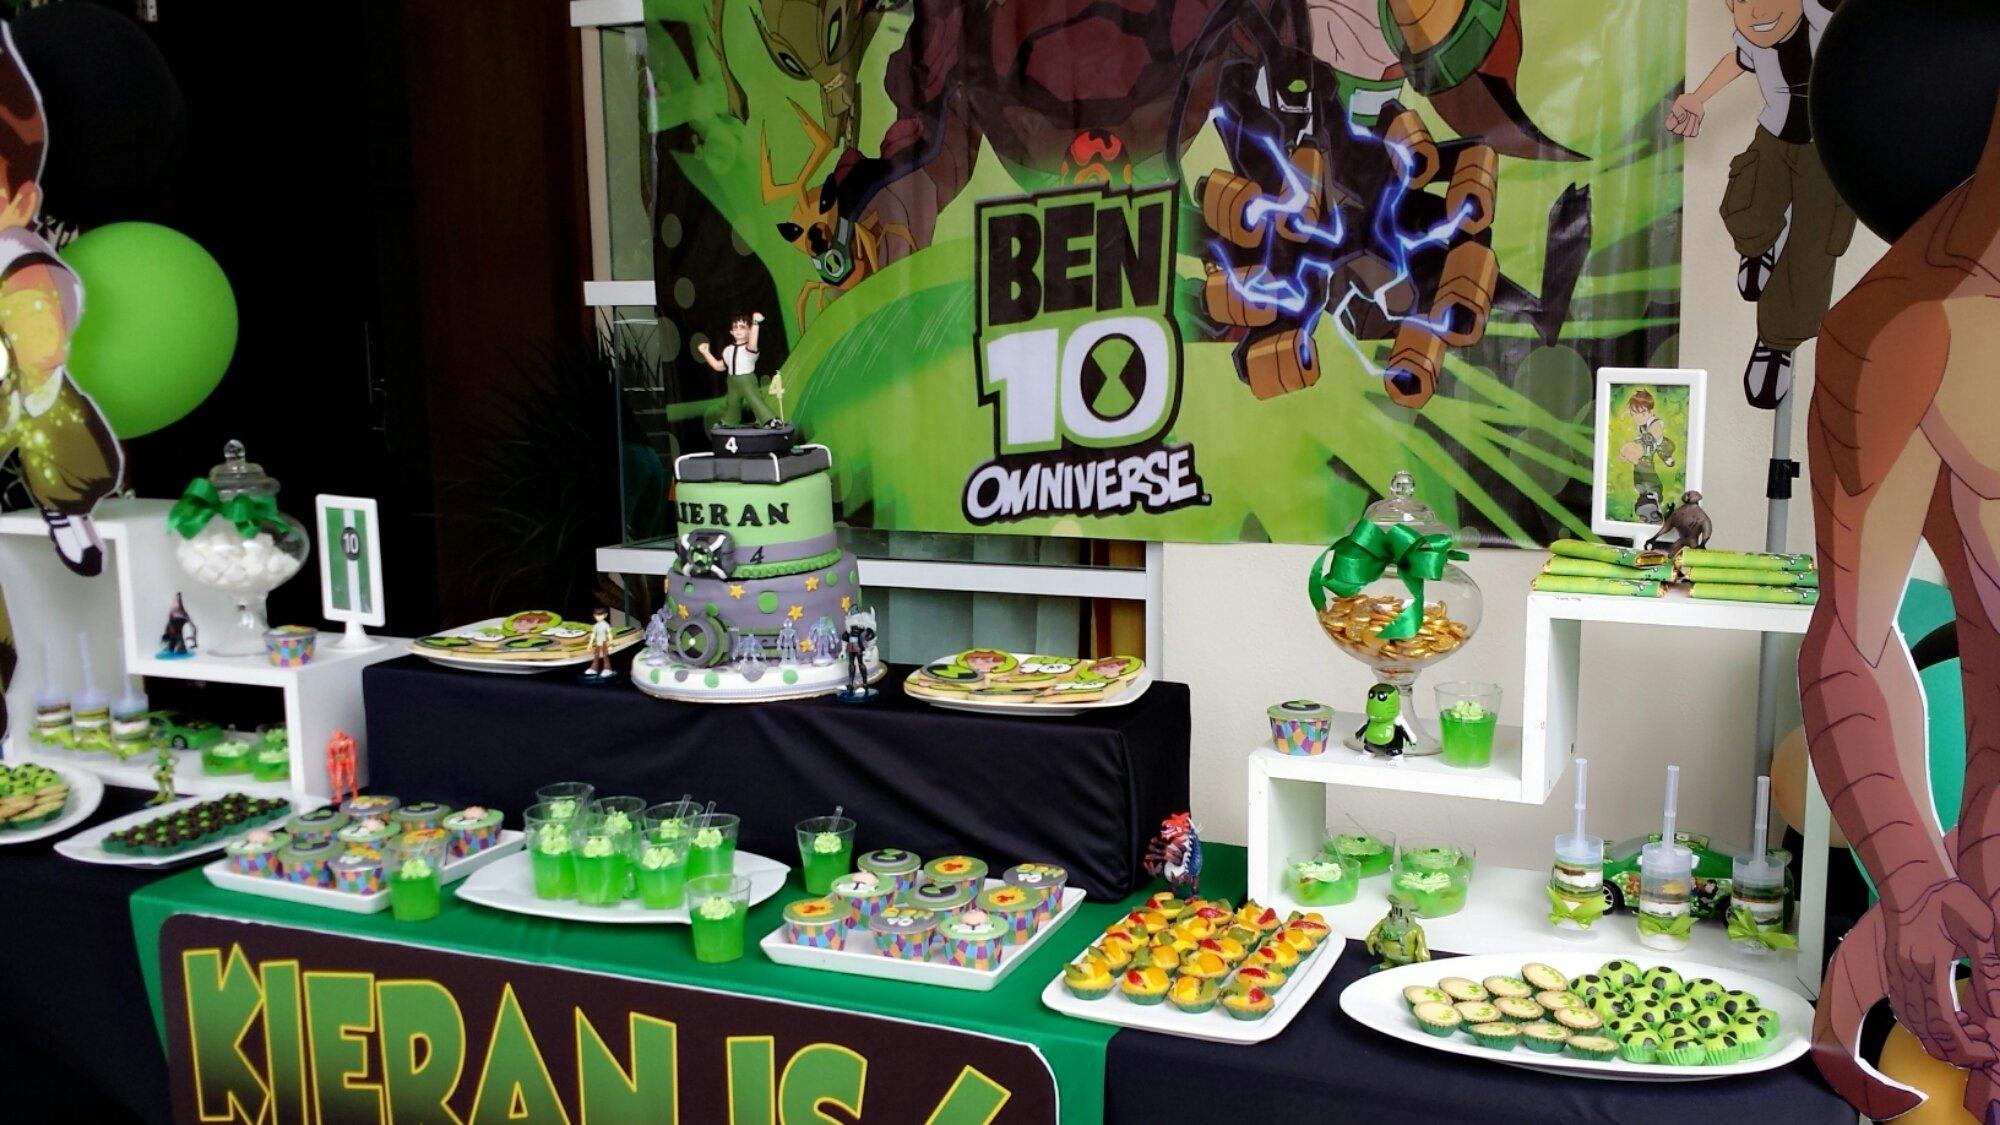 10 Trendy Ben 10 Birthday Party Ideas ben 10 birthday party ideas picnikpartyideas